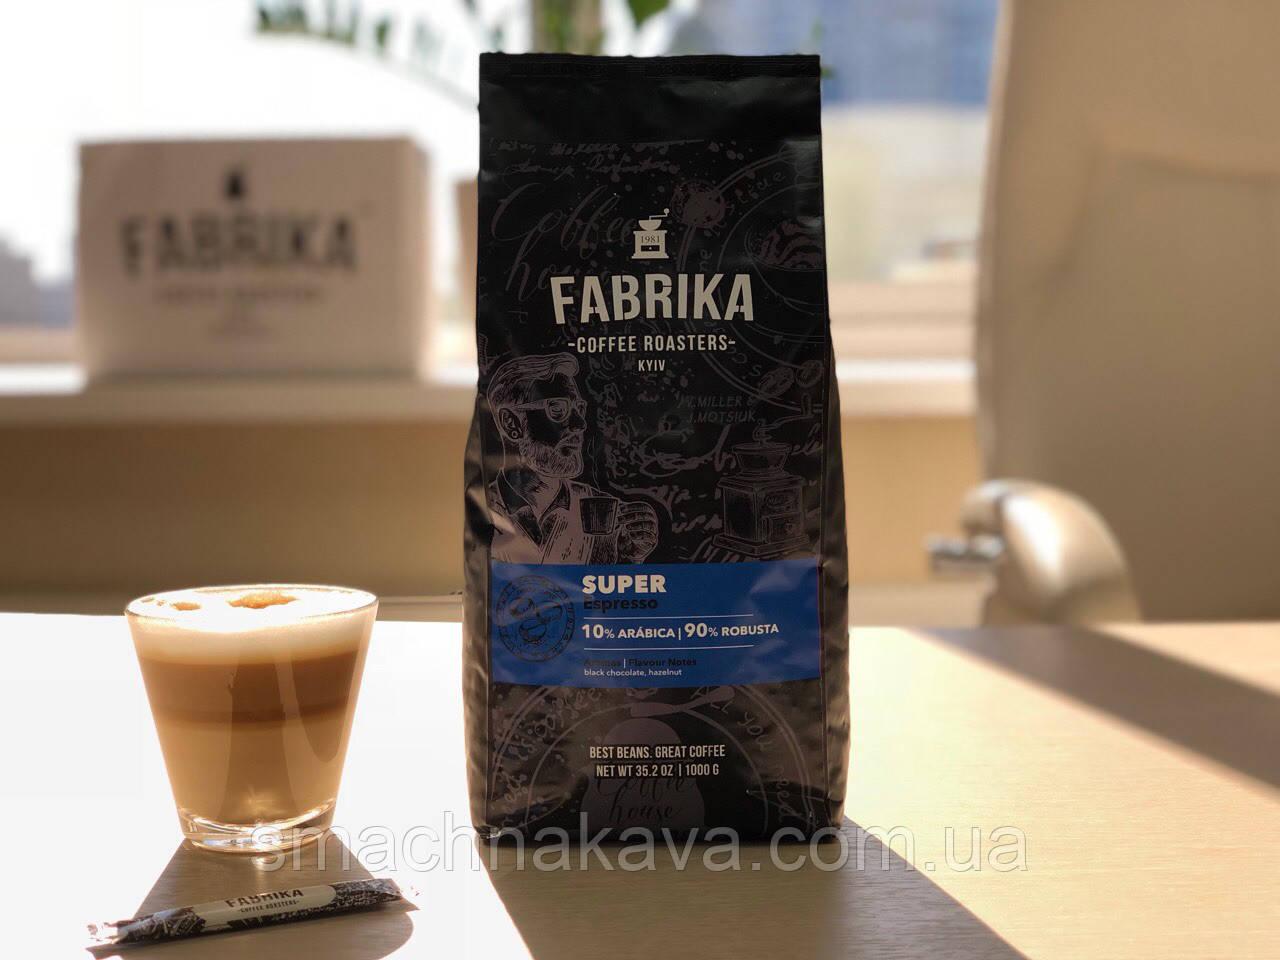 Кофе в зернах Fabrika Super Espresso